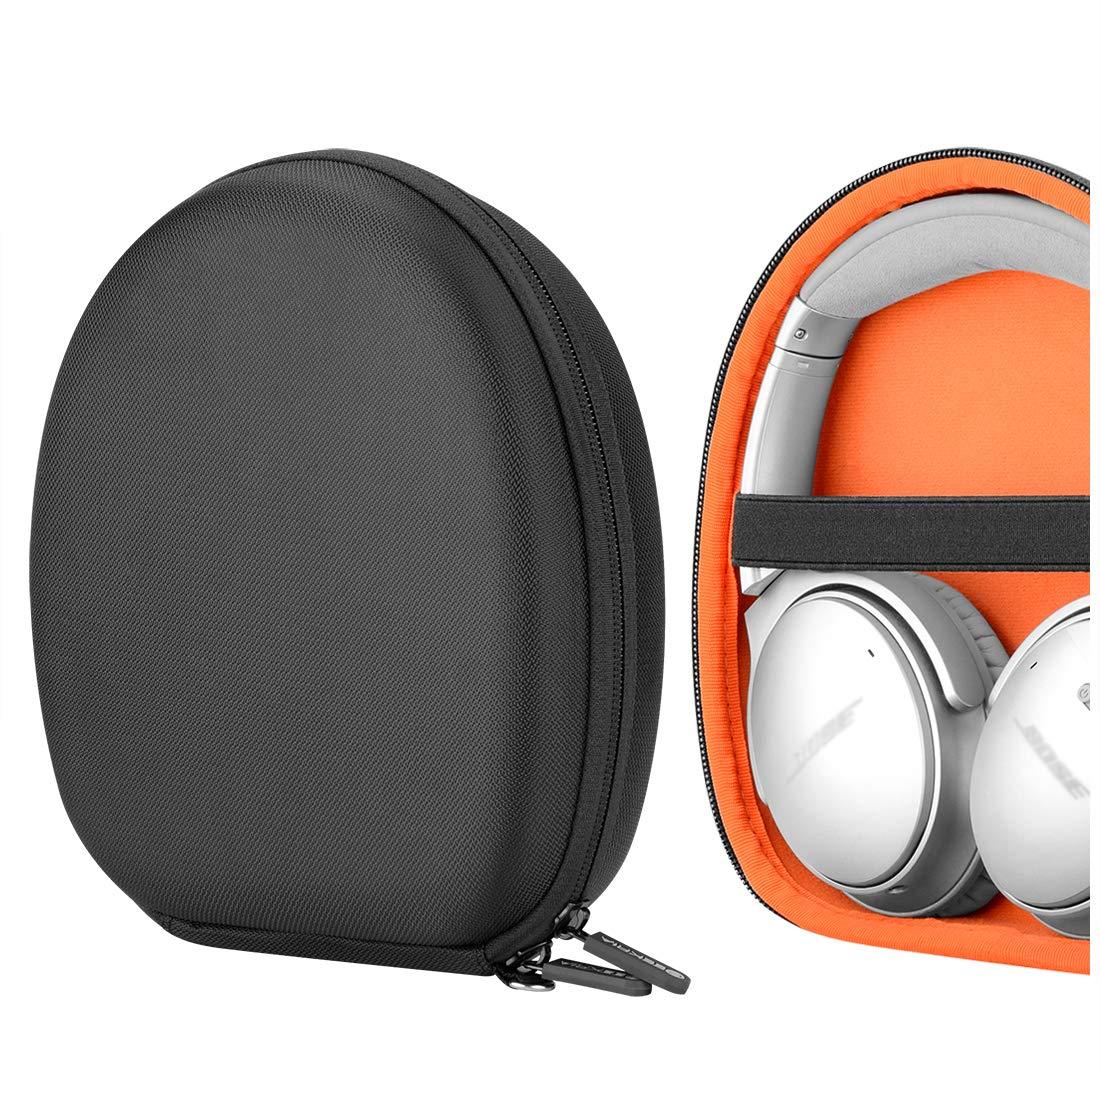 Headphone carry case for Bose BOSE AE2W AE2 OE2i OE2 Around Ear On Ear Brand New